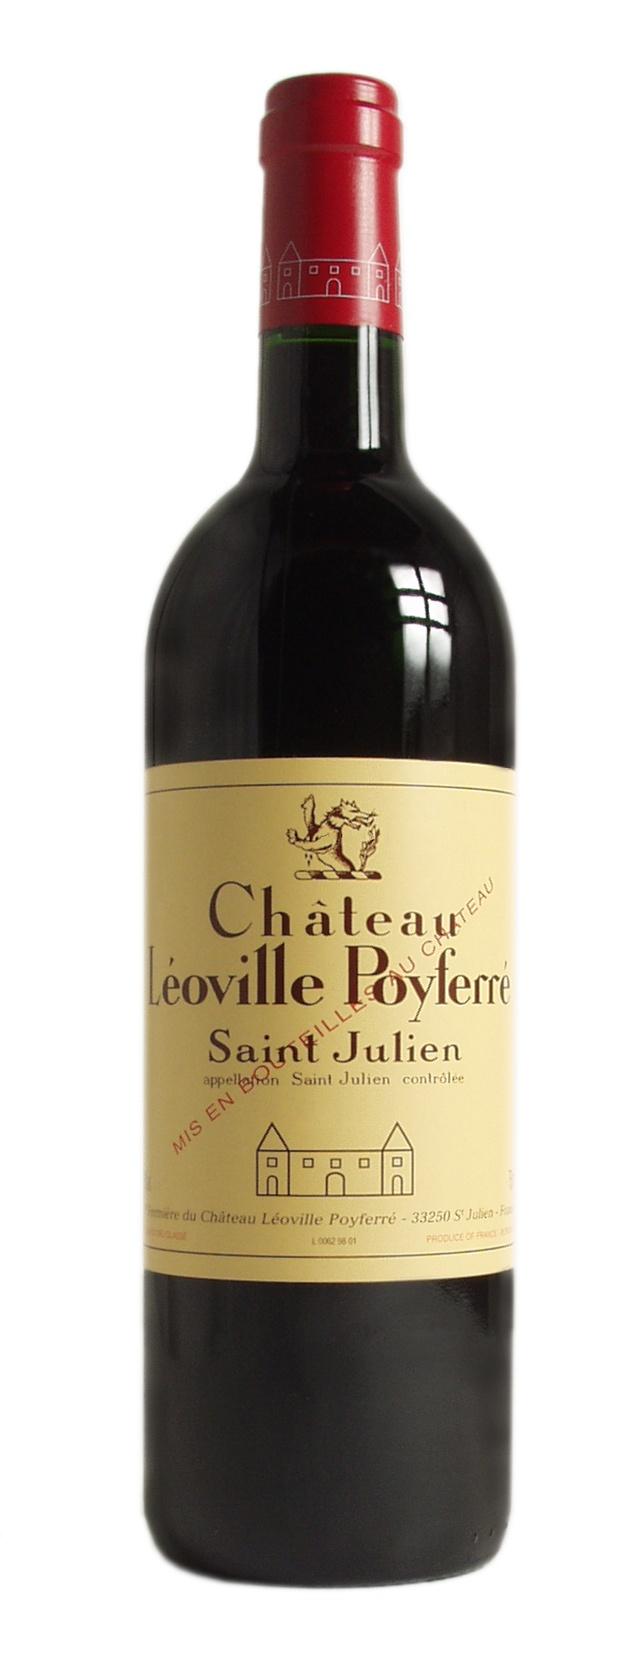 CHÂTEAU LEOVILLE POYFERRE http://www.wineandco.com/chateau-leoville-poyferre-5474-m-fr-eur-fr.html